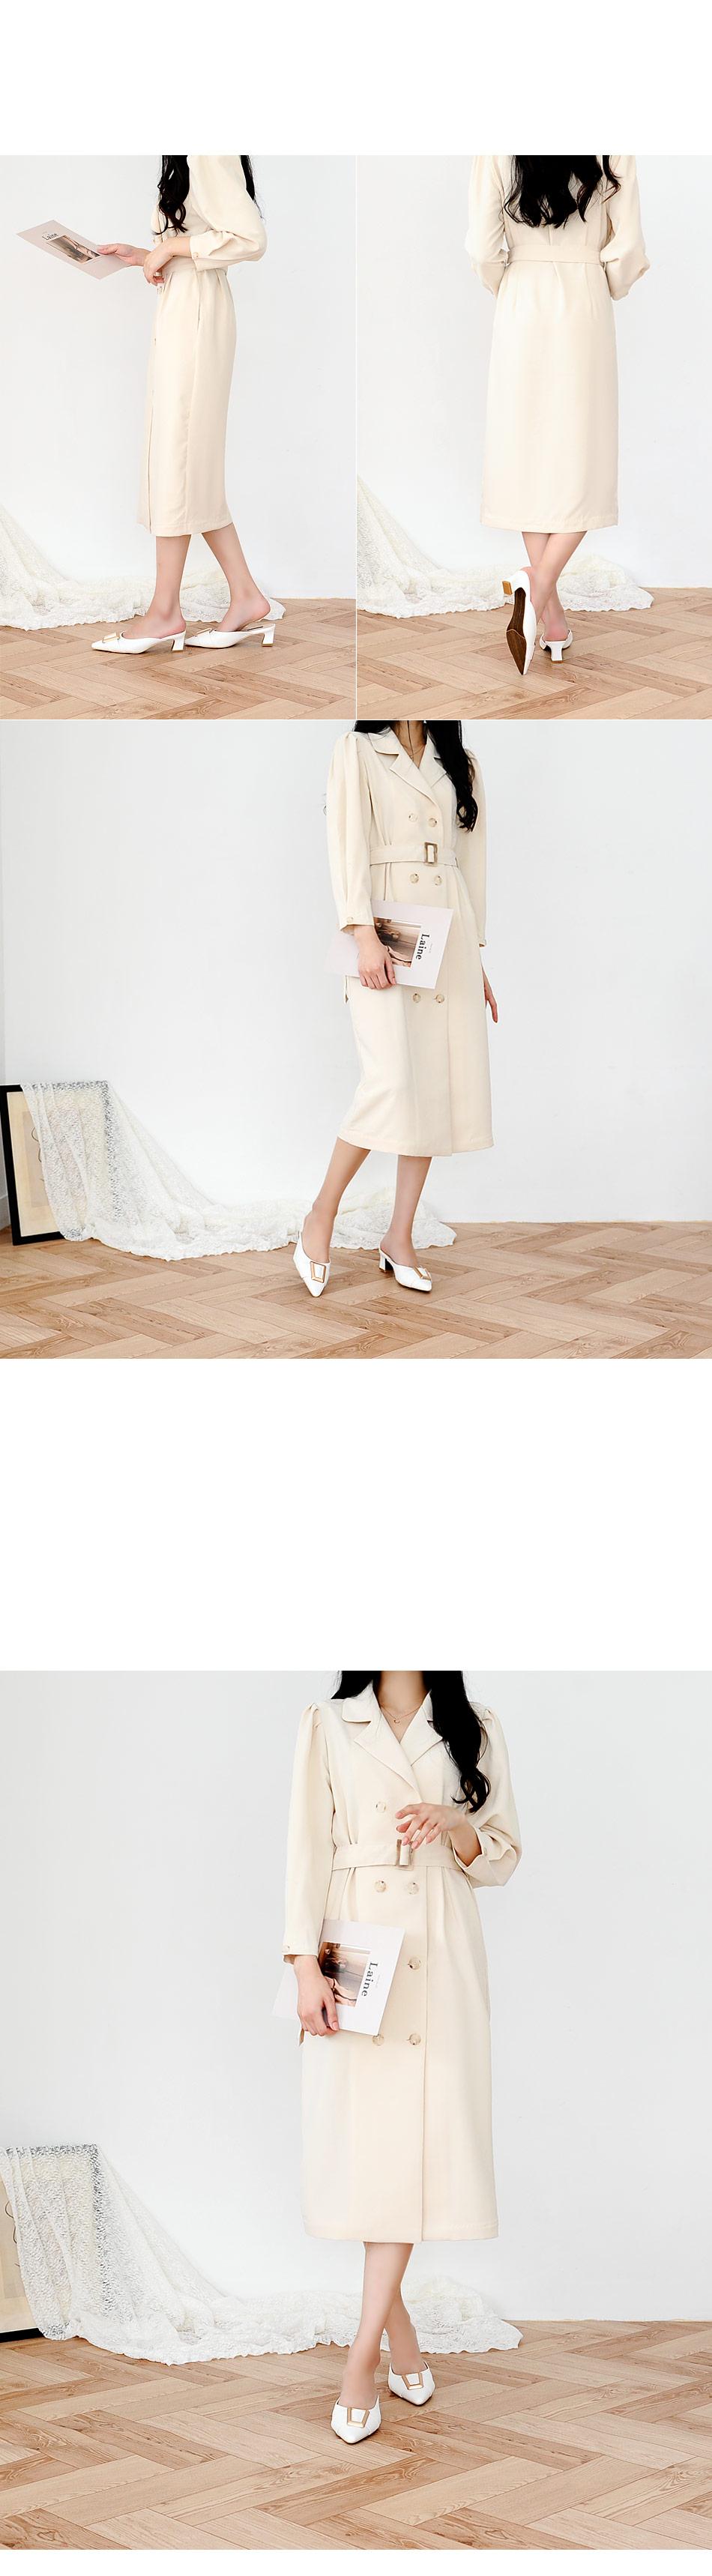 Ricoen Trench Dress